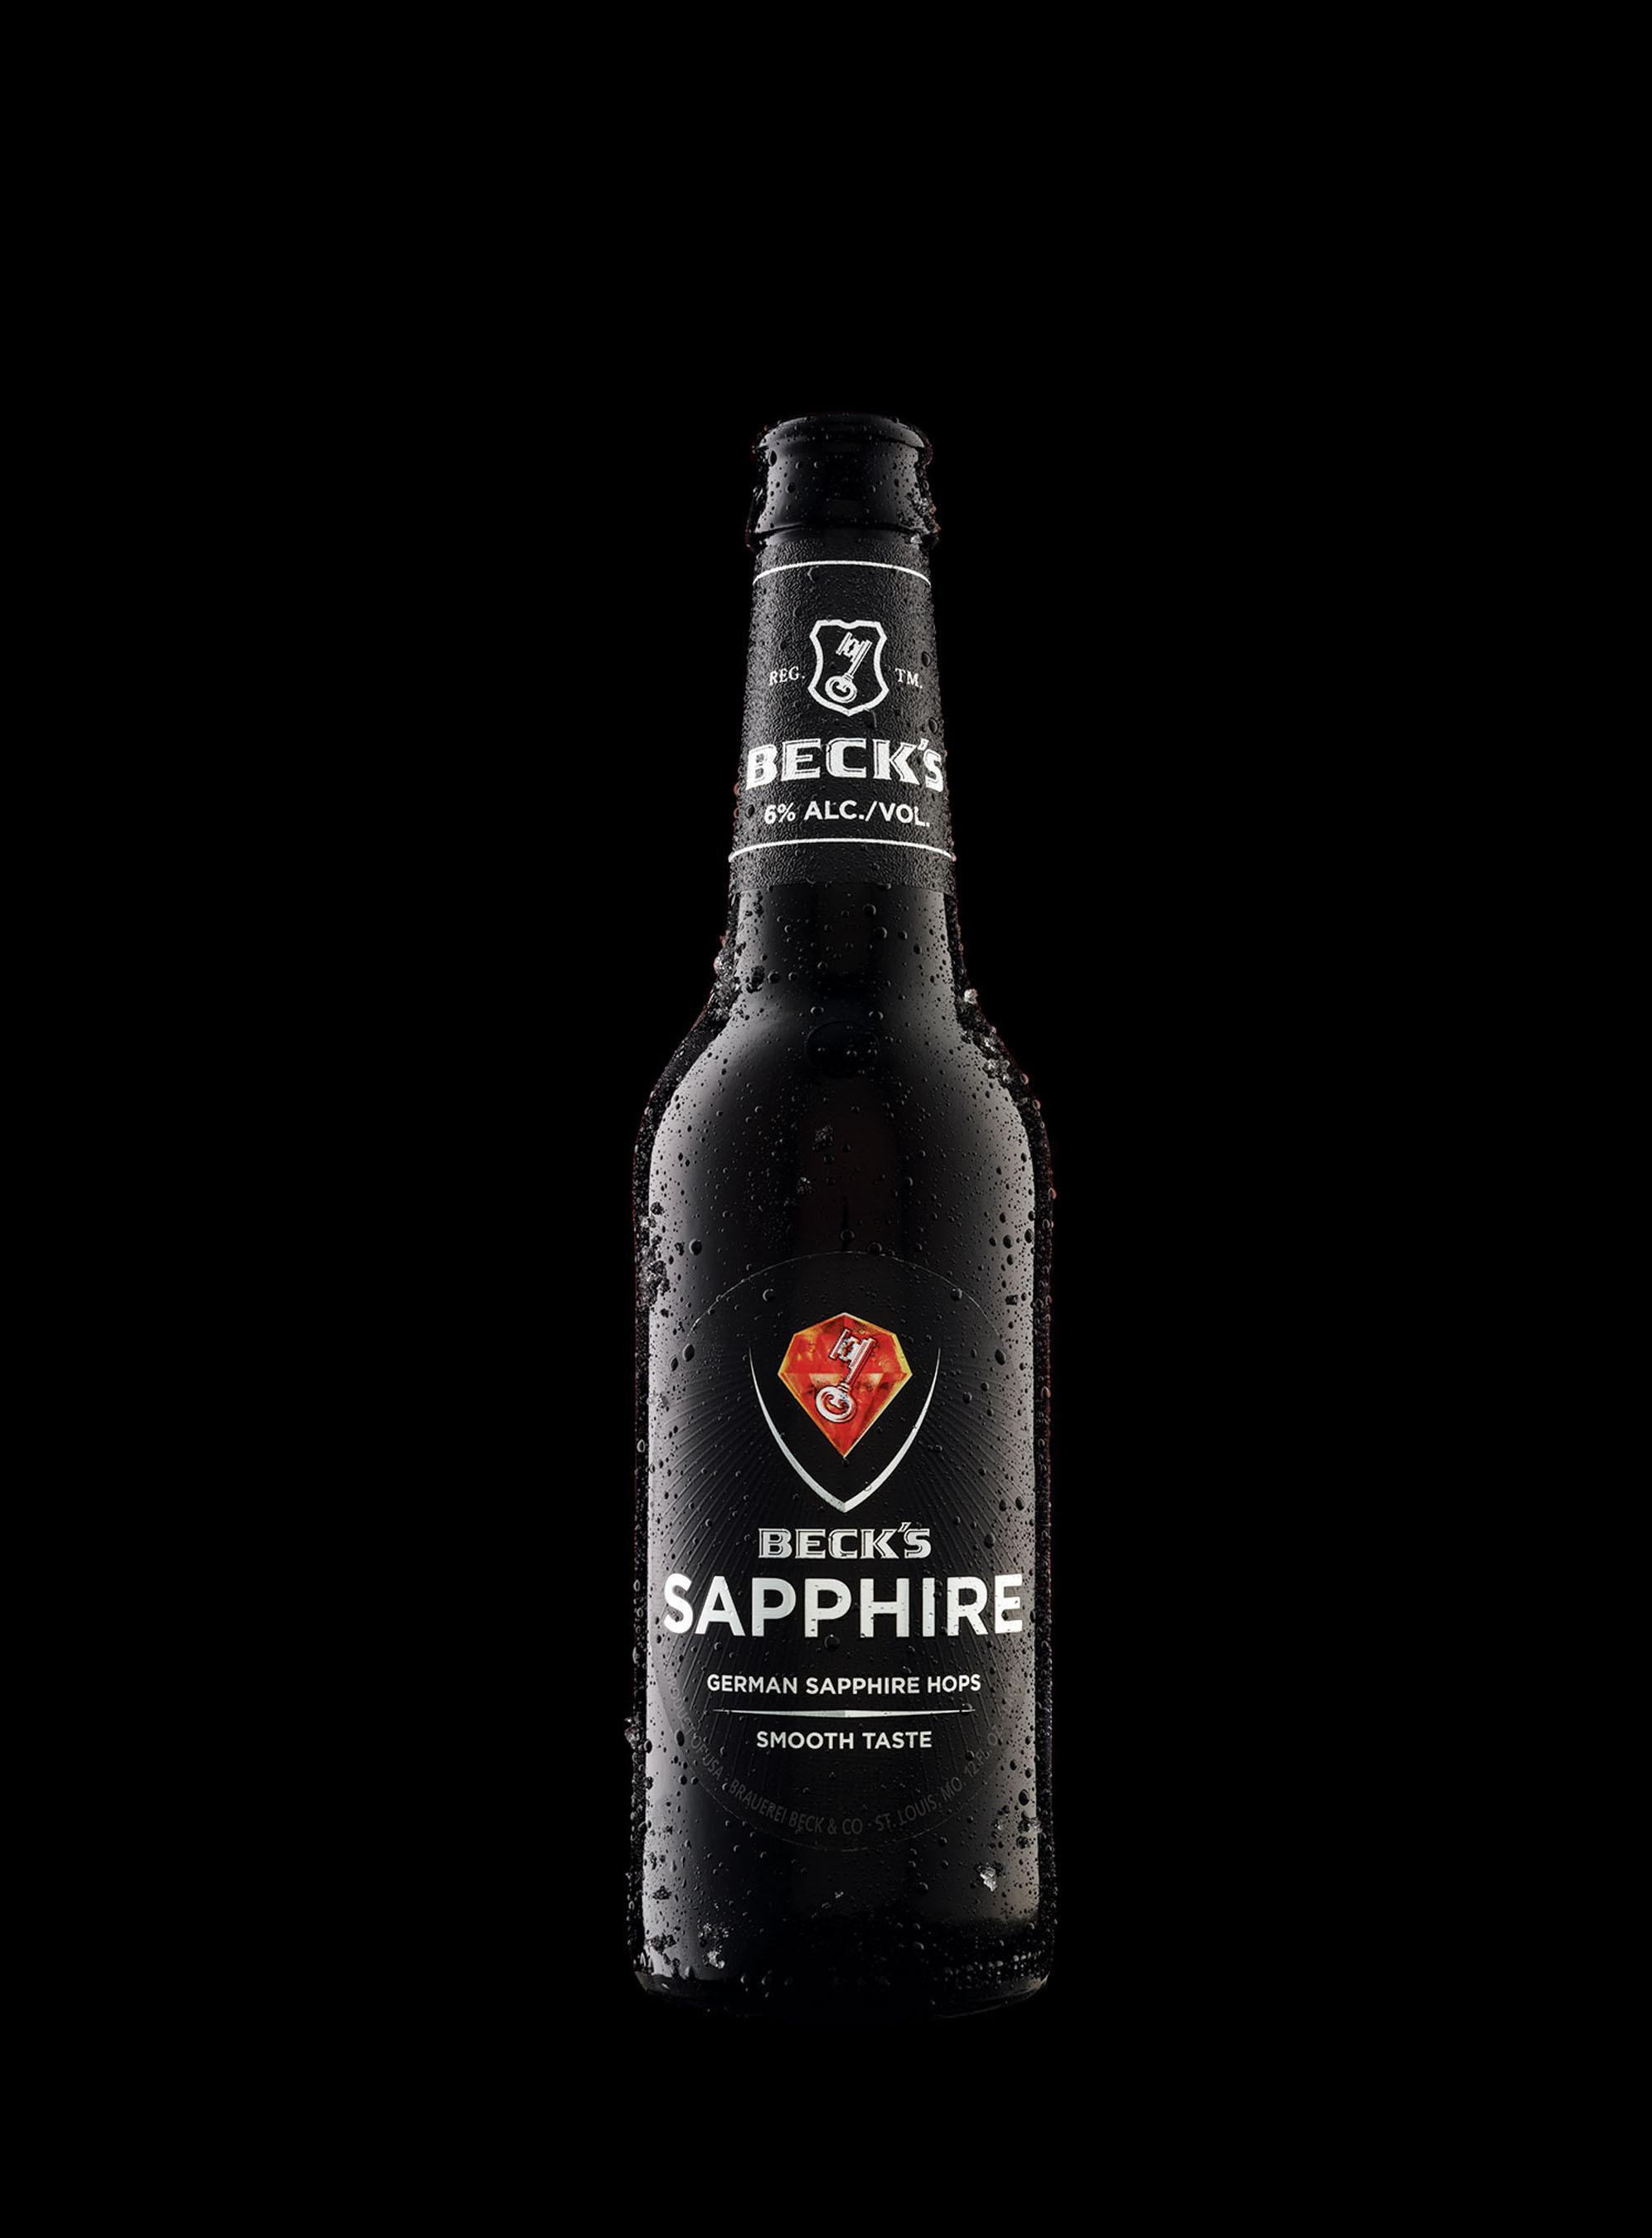 Beck's Sapphire Targets Premium Drinkers